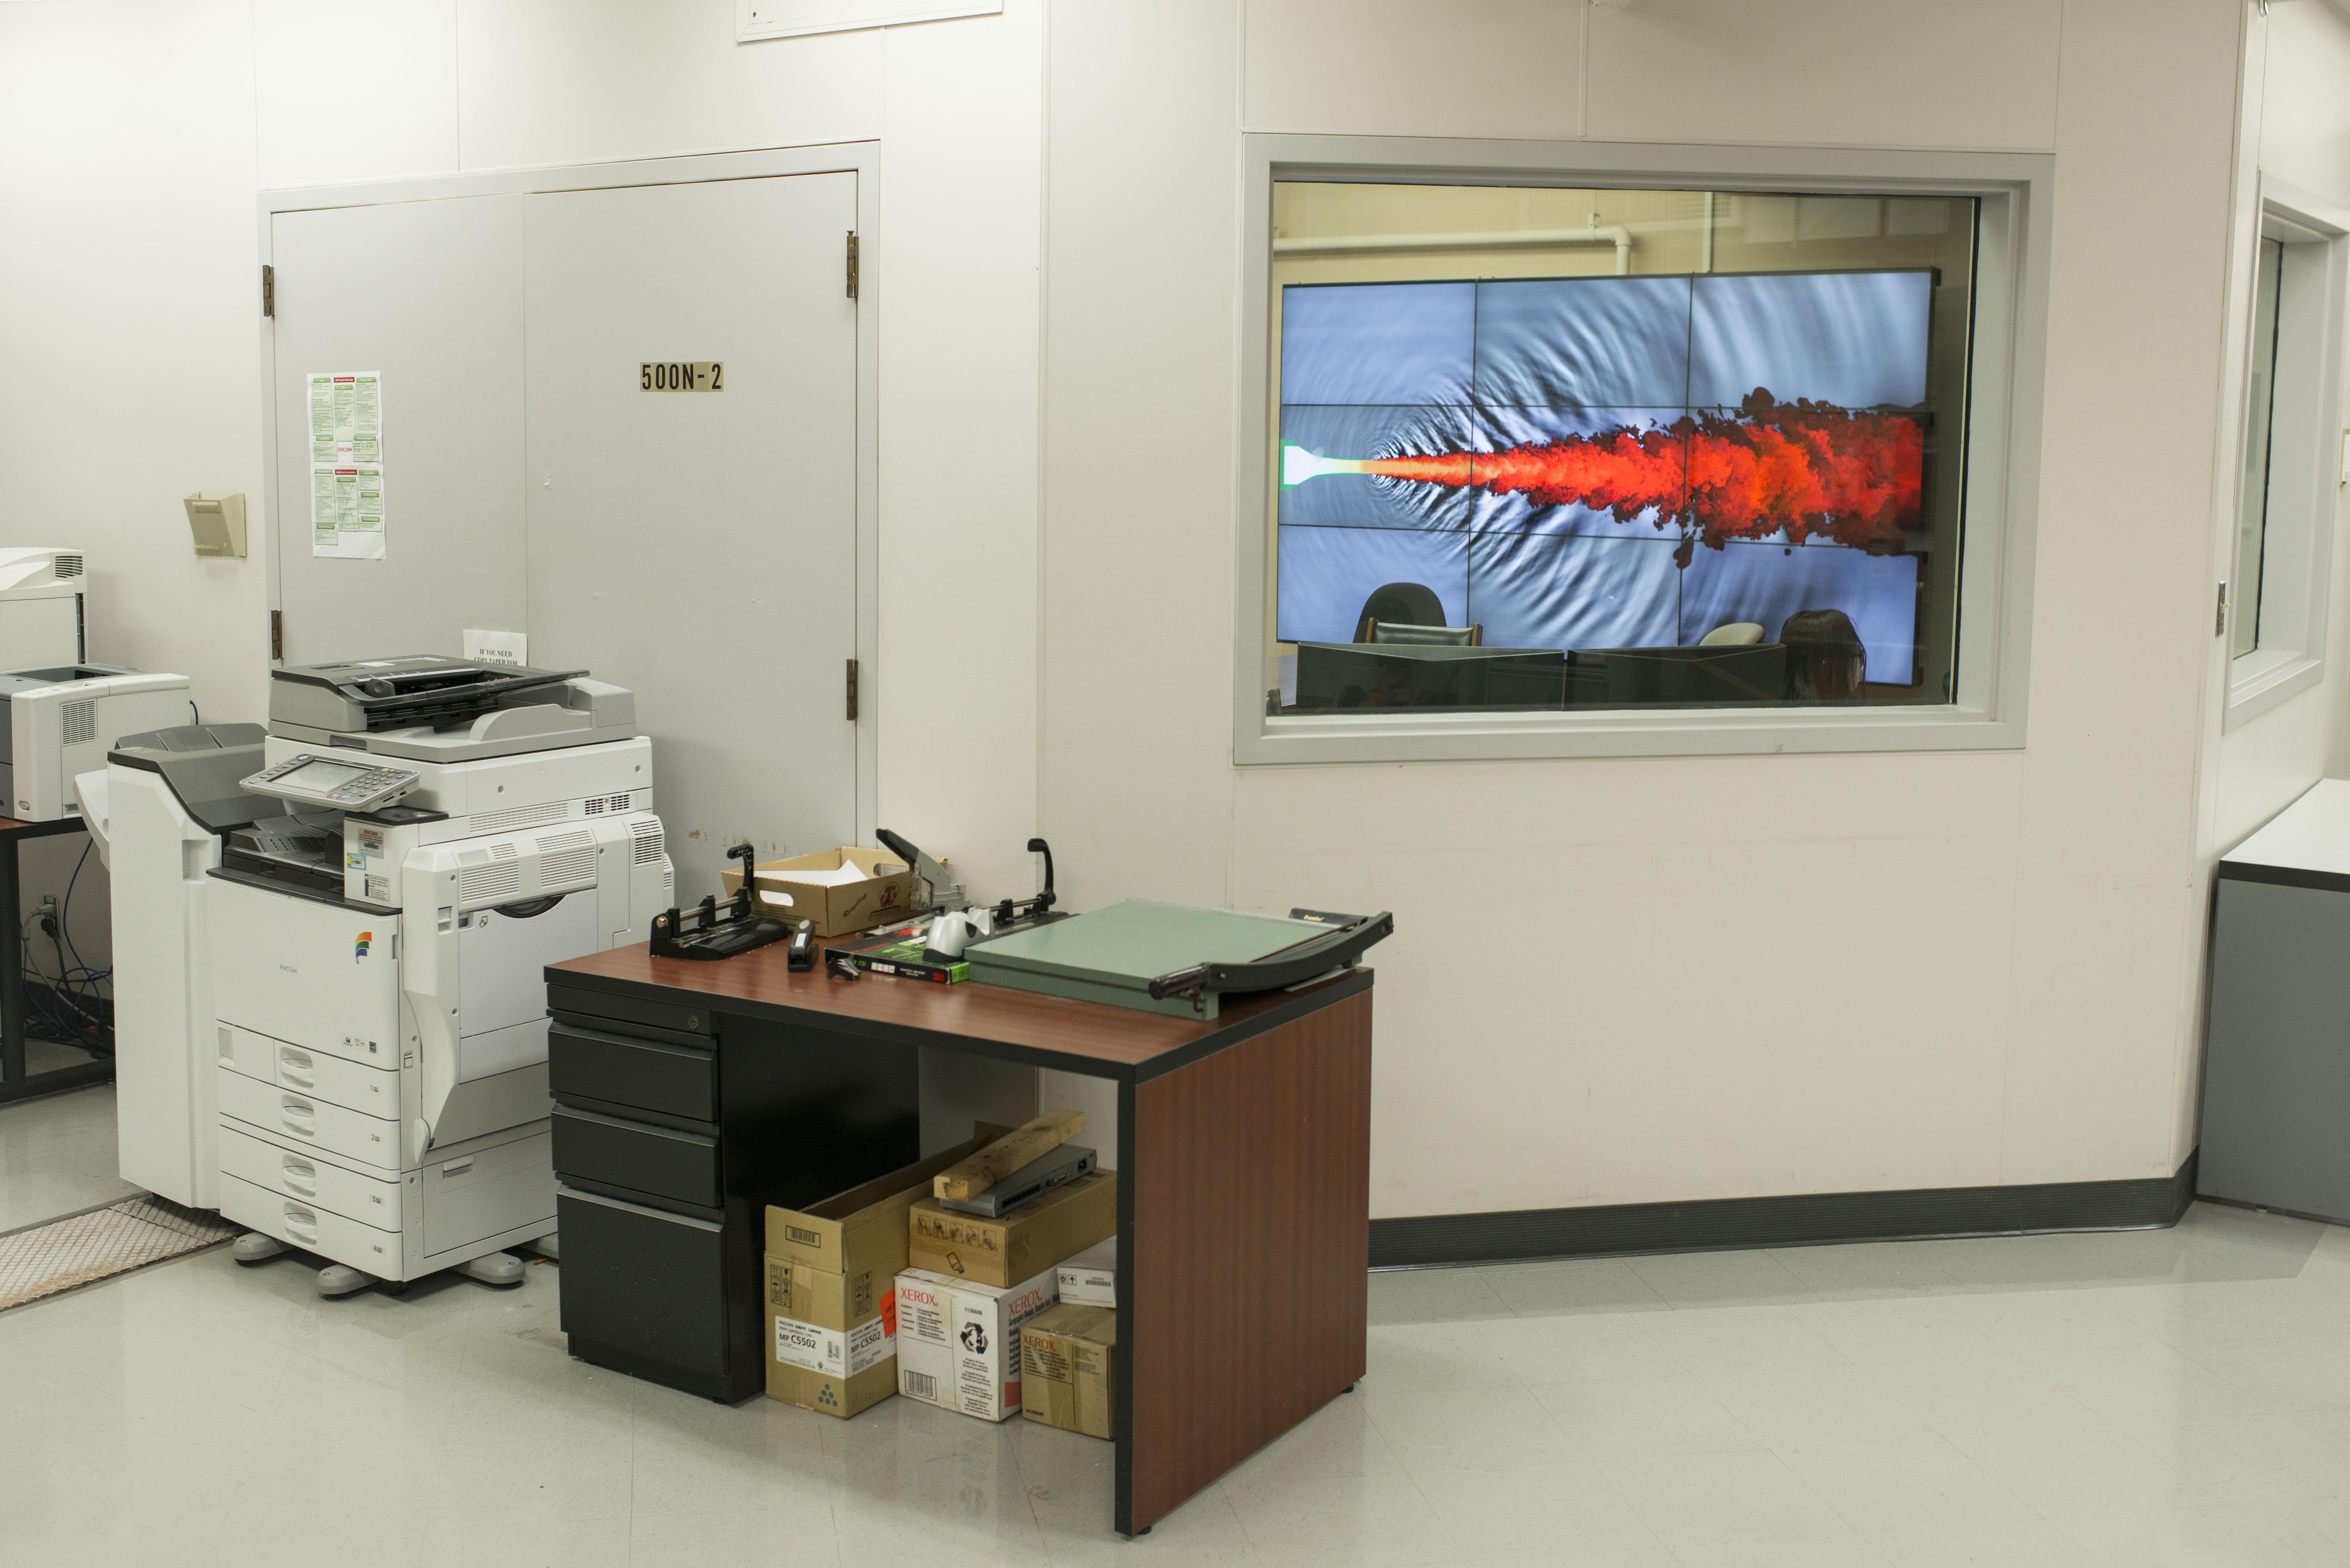 Fredrick Terman Labs, Stanford, CA